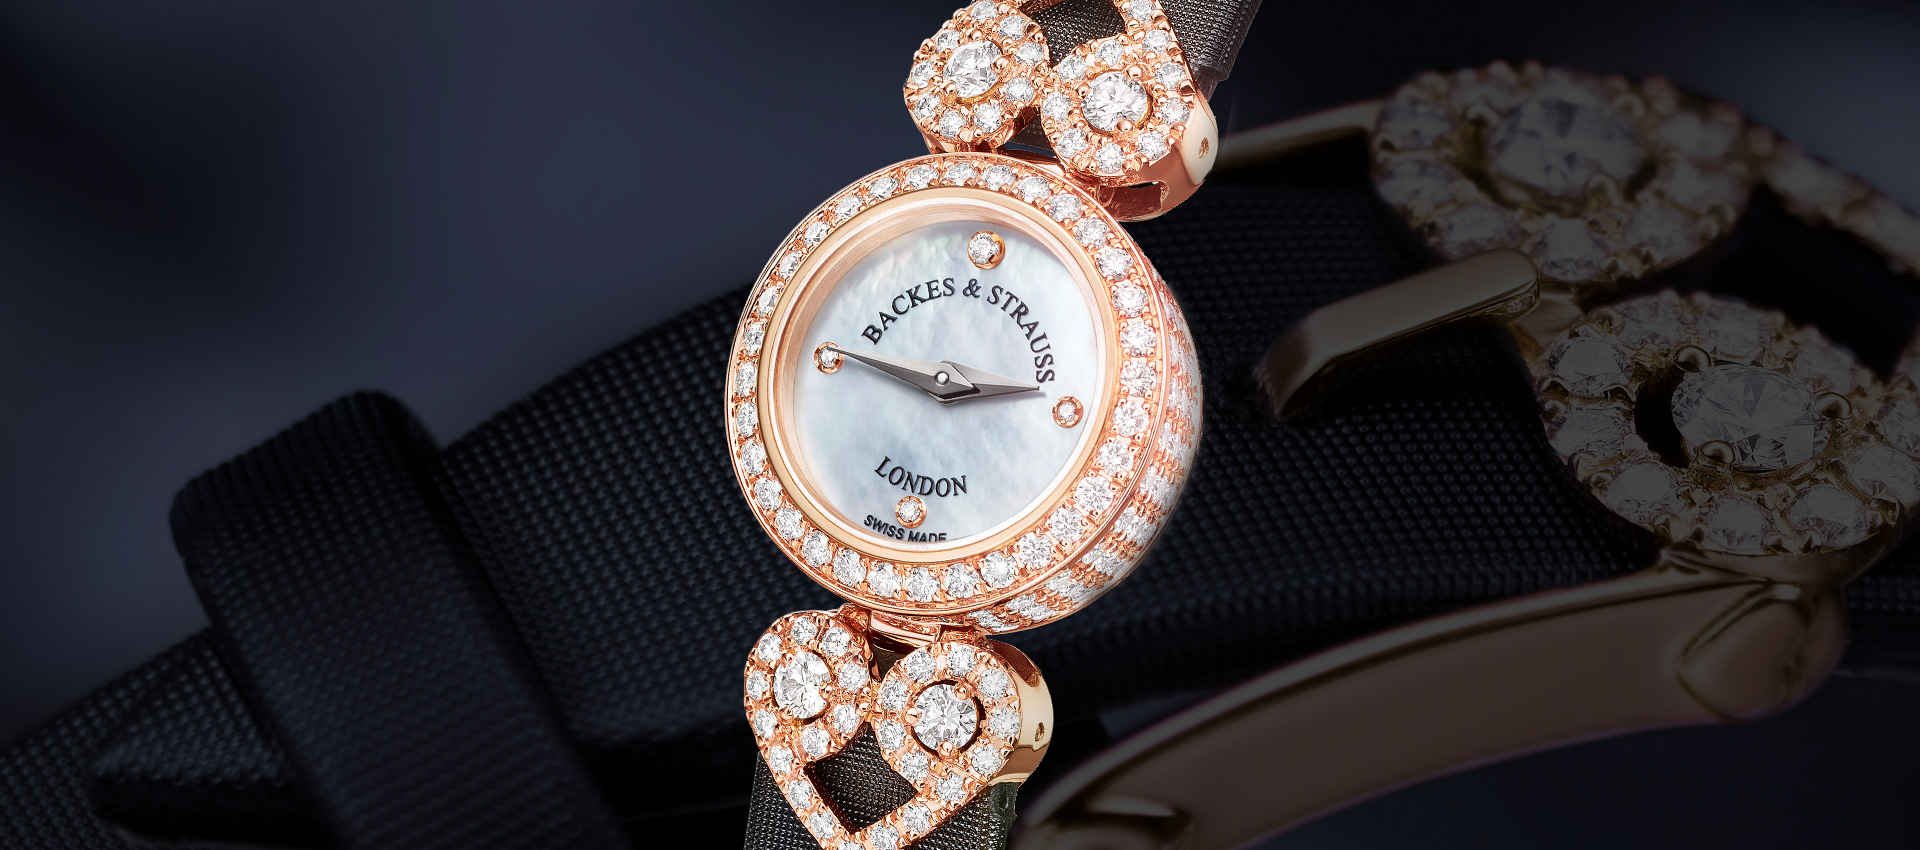 Miss Victoria diamond watches for women